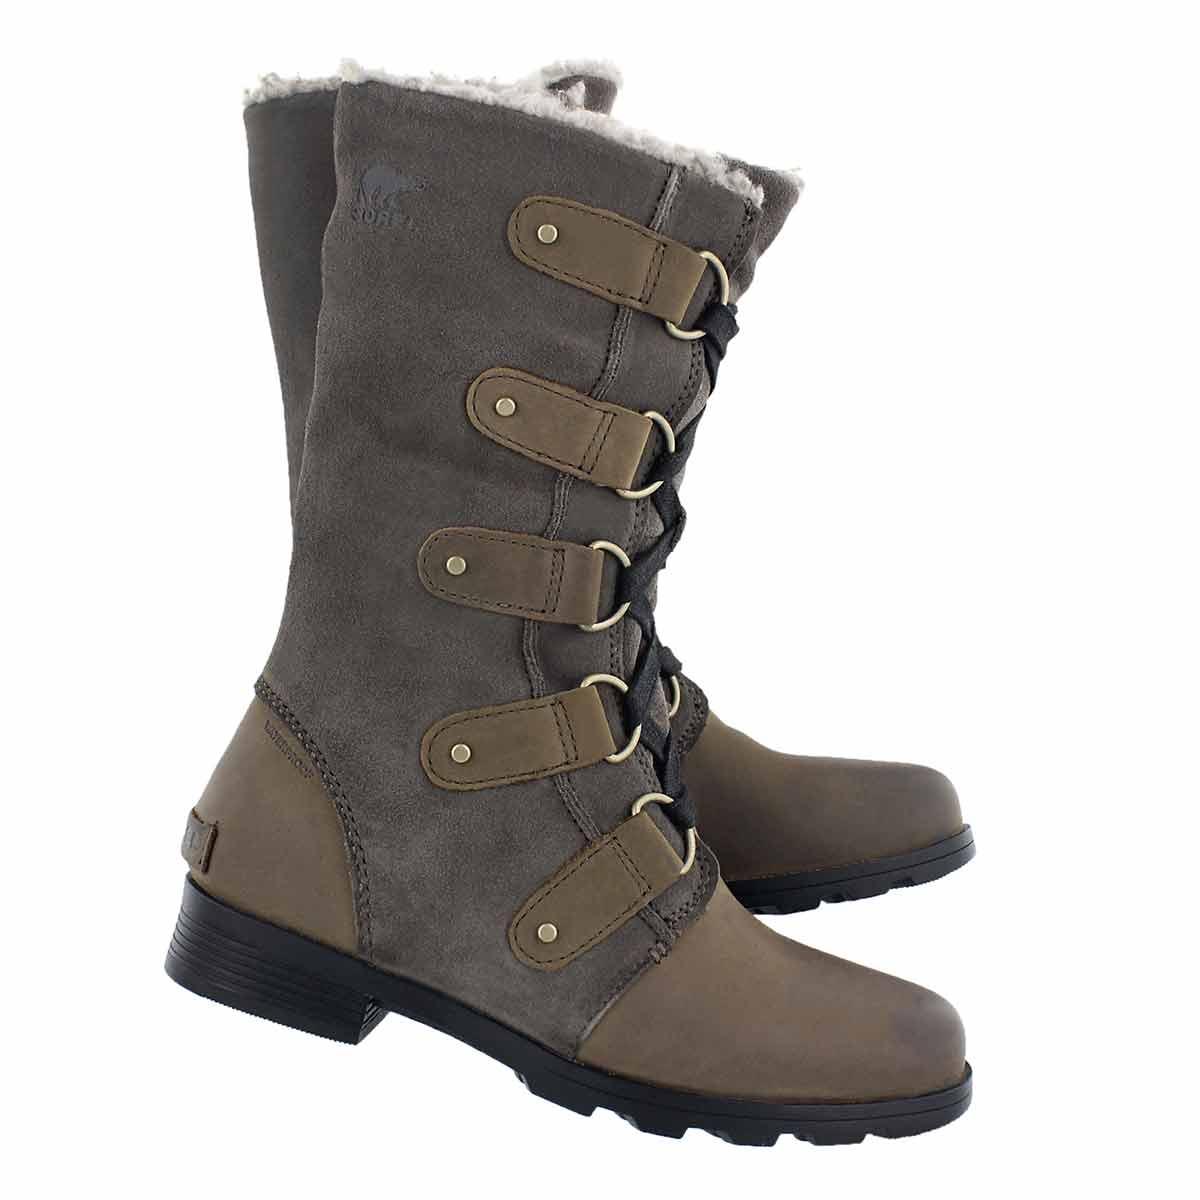 Lds Emelie Lace major/bk waterproof boot